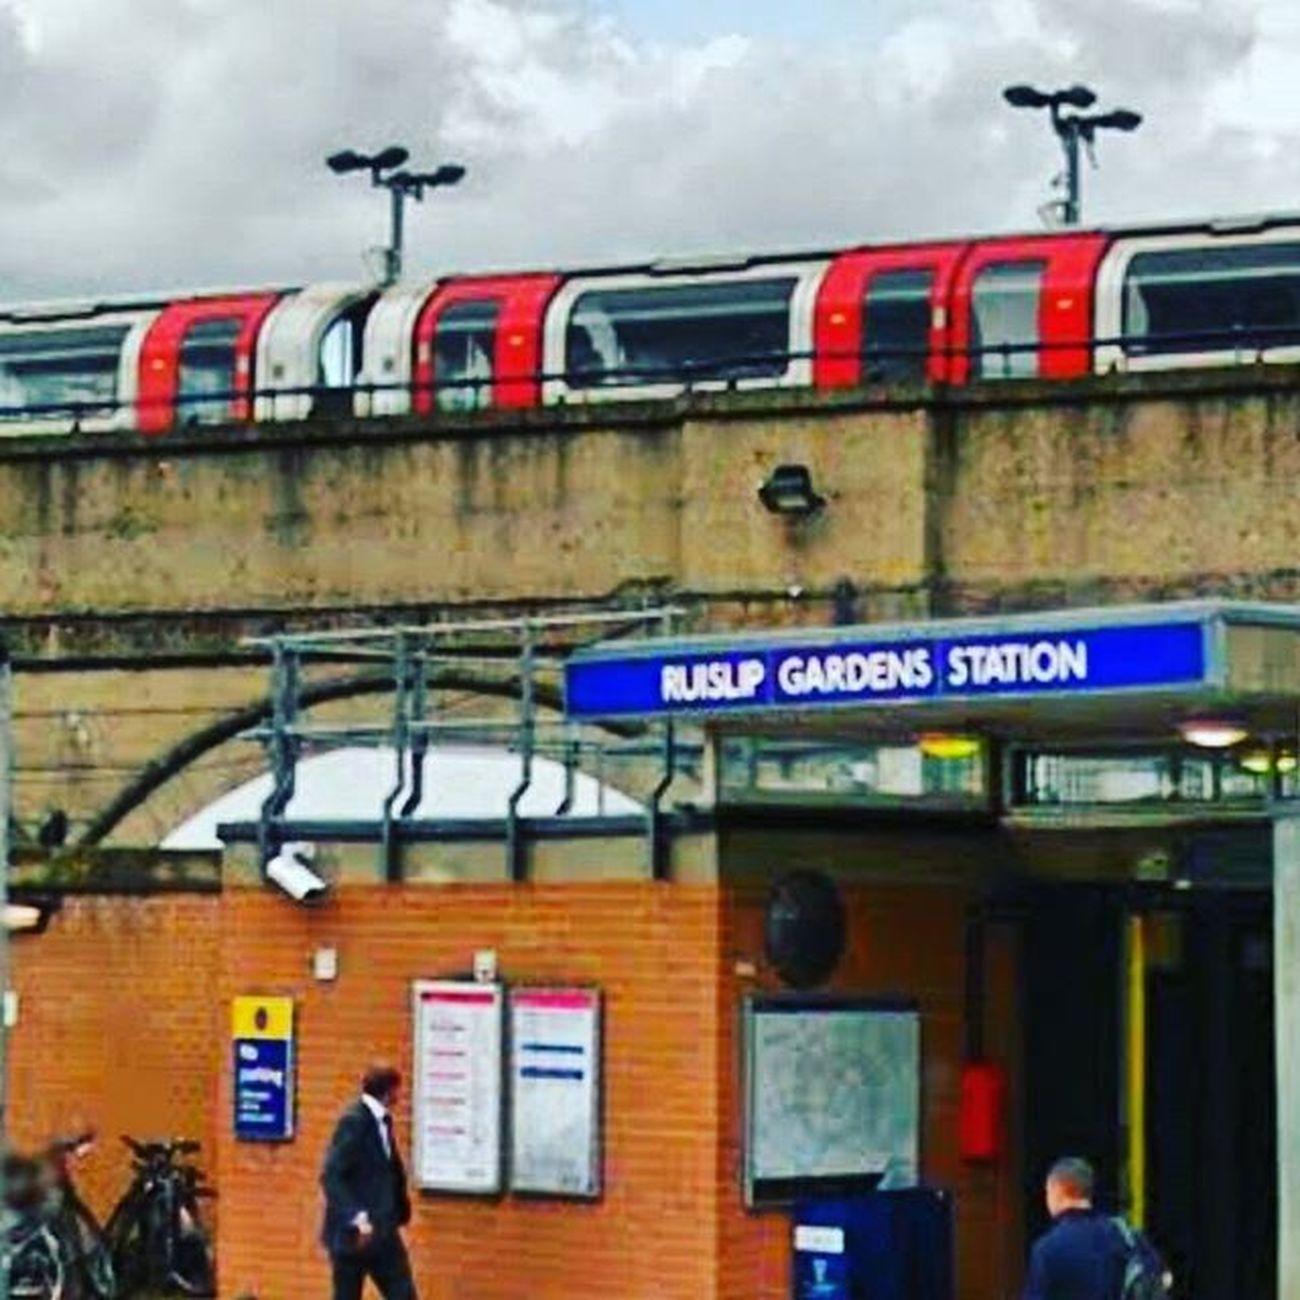 Ruislip gardens ,central line Centralline Ruislip Ruislipgardens London Londonunderground Tfl